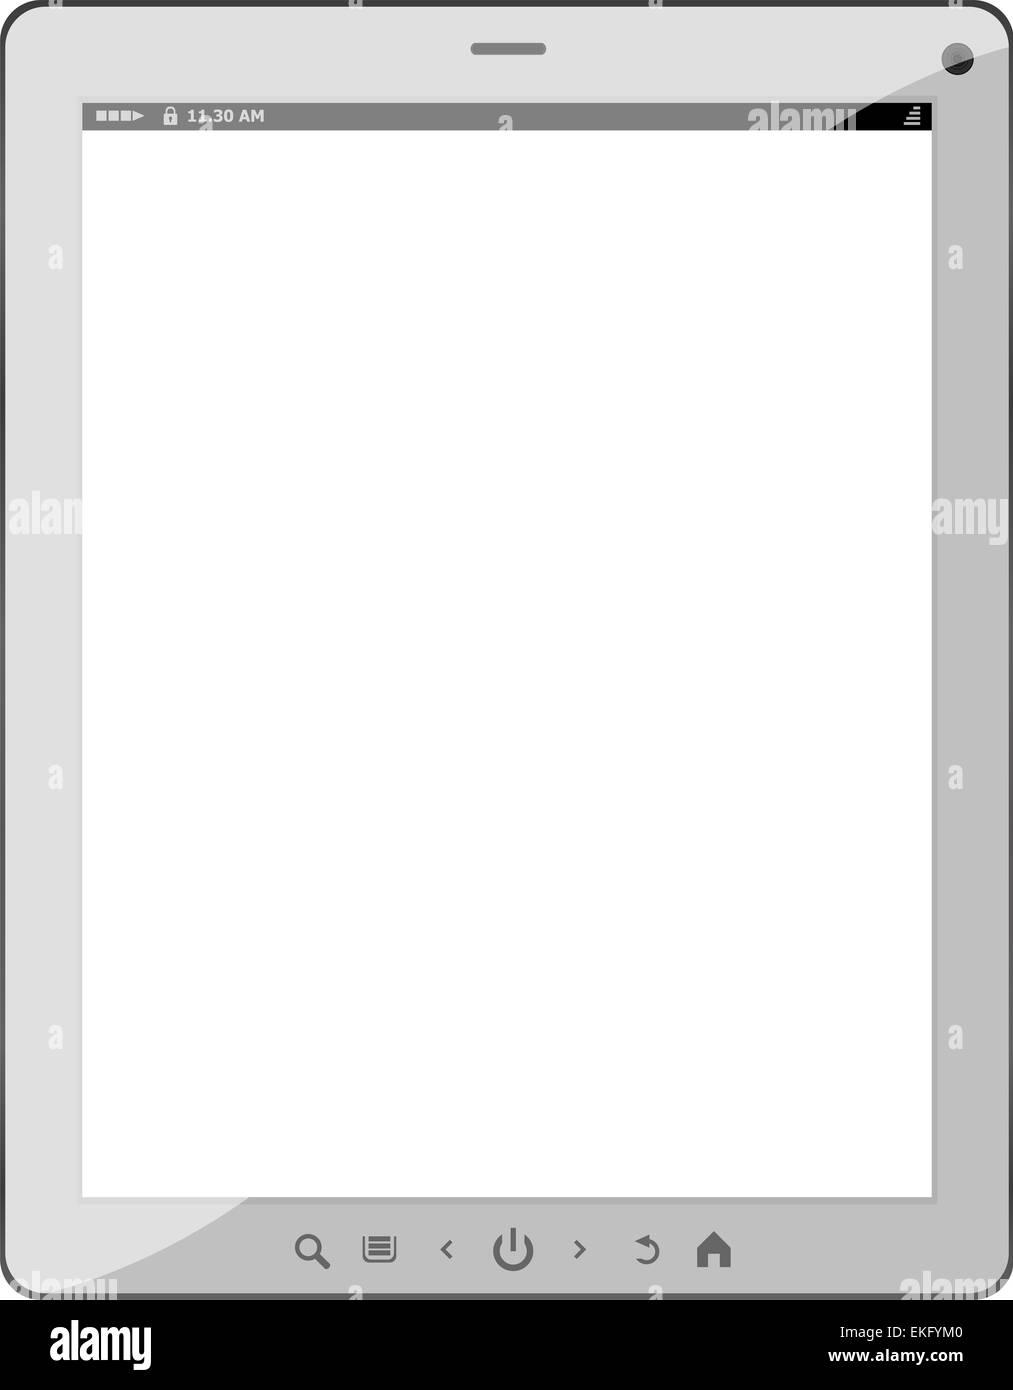 white tablet pc on white background - Stock Image